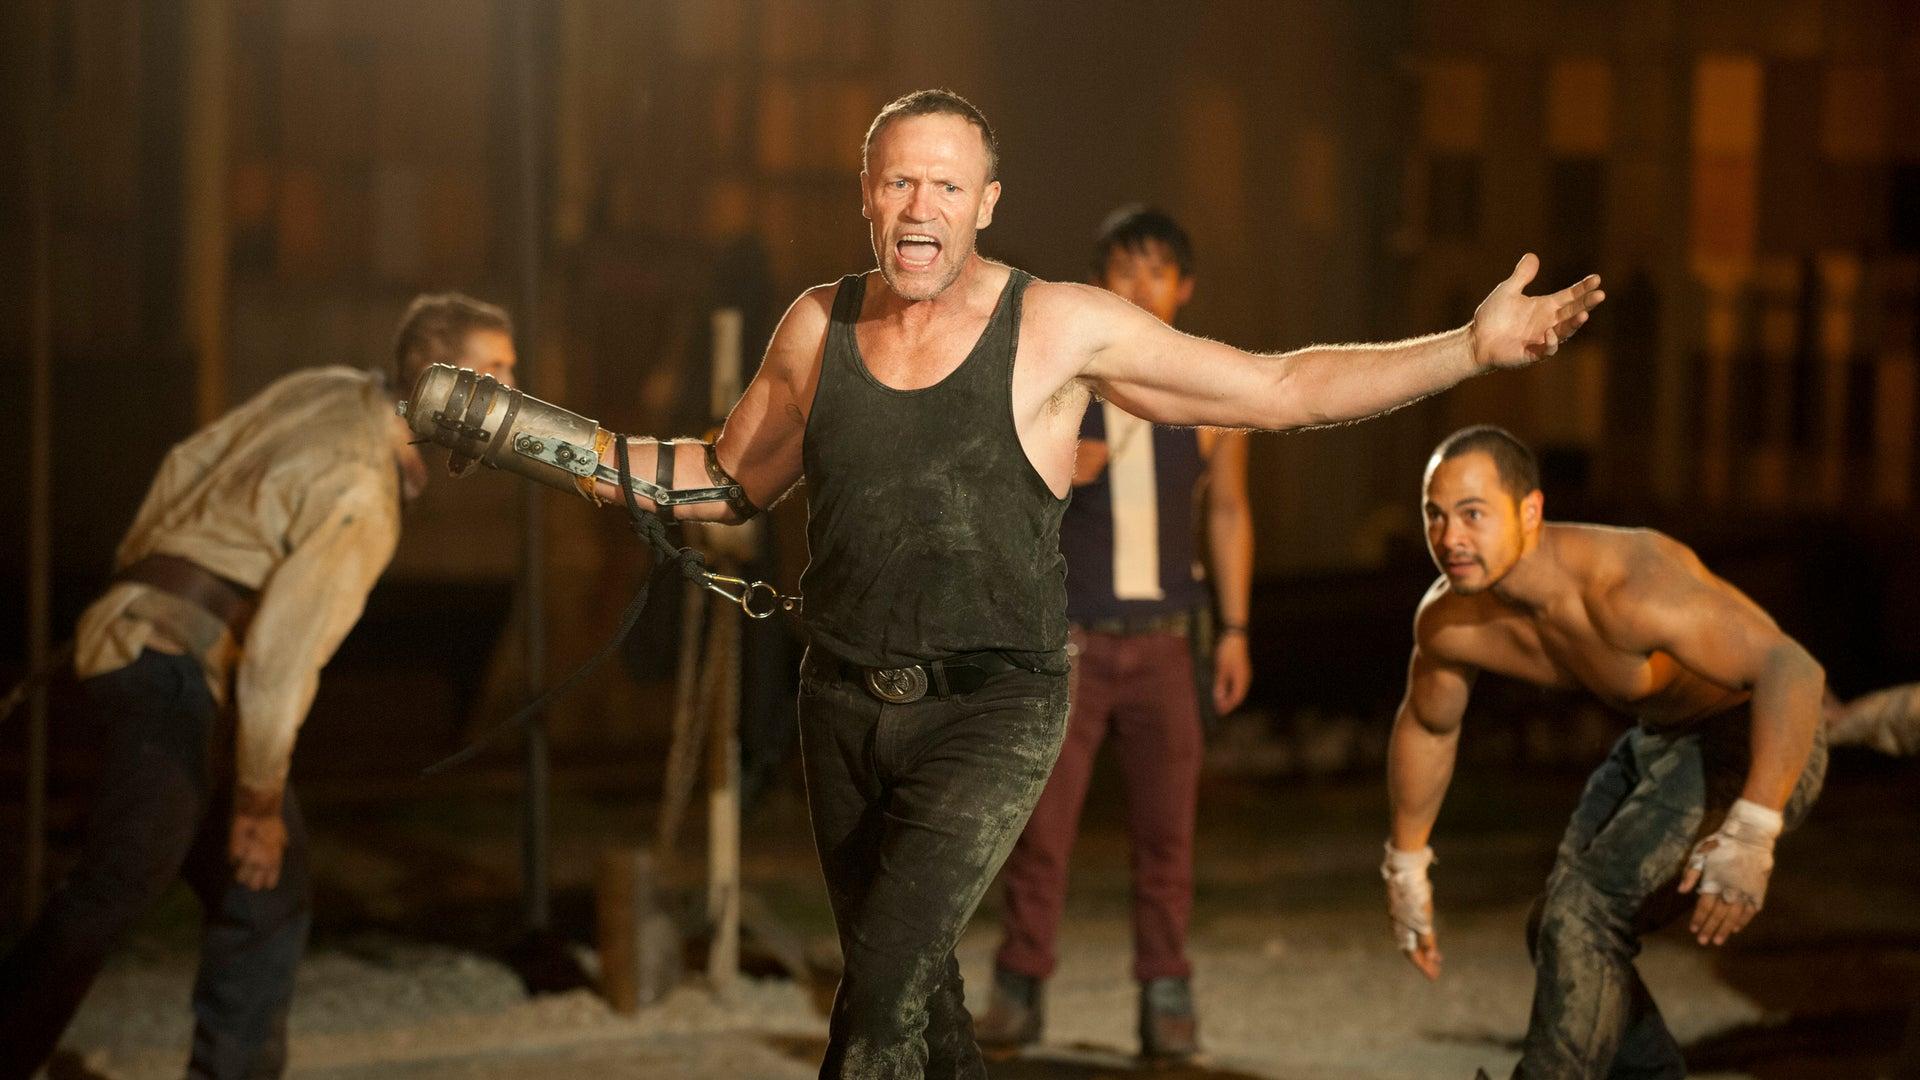 Merle Dixon (Michael Rooker) and Martinez (Jose Pablo Cantillo), The Walking Dead